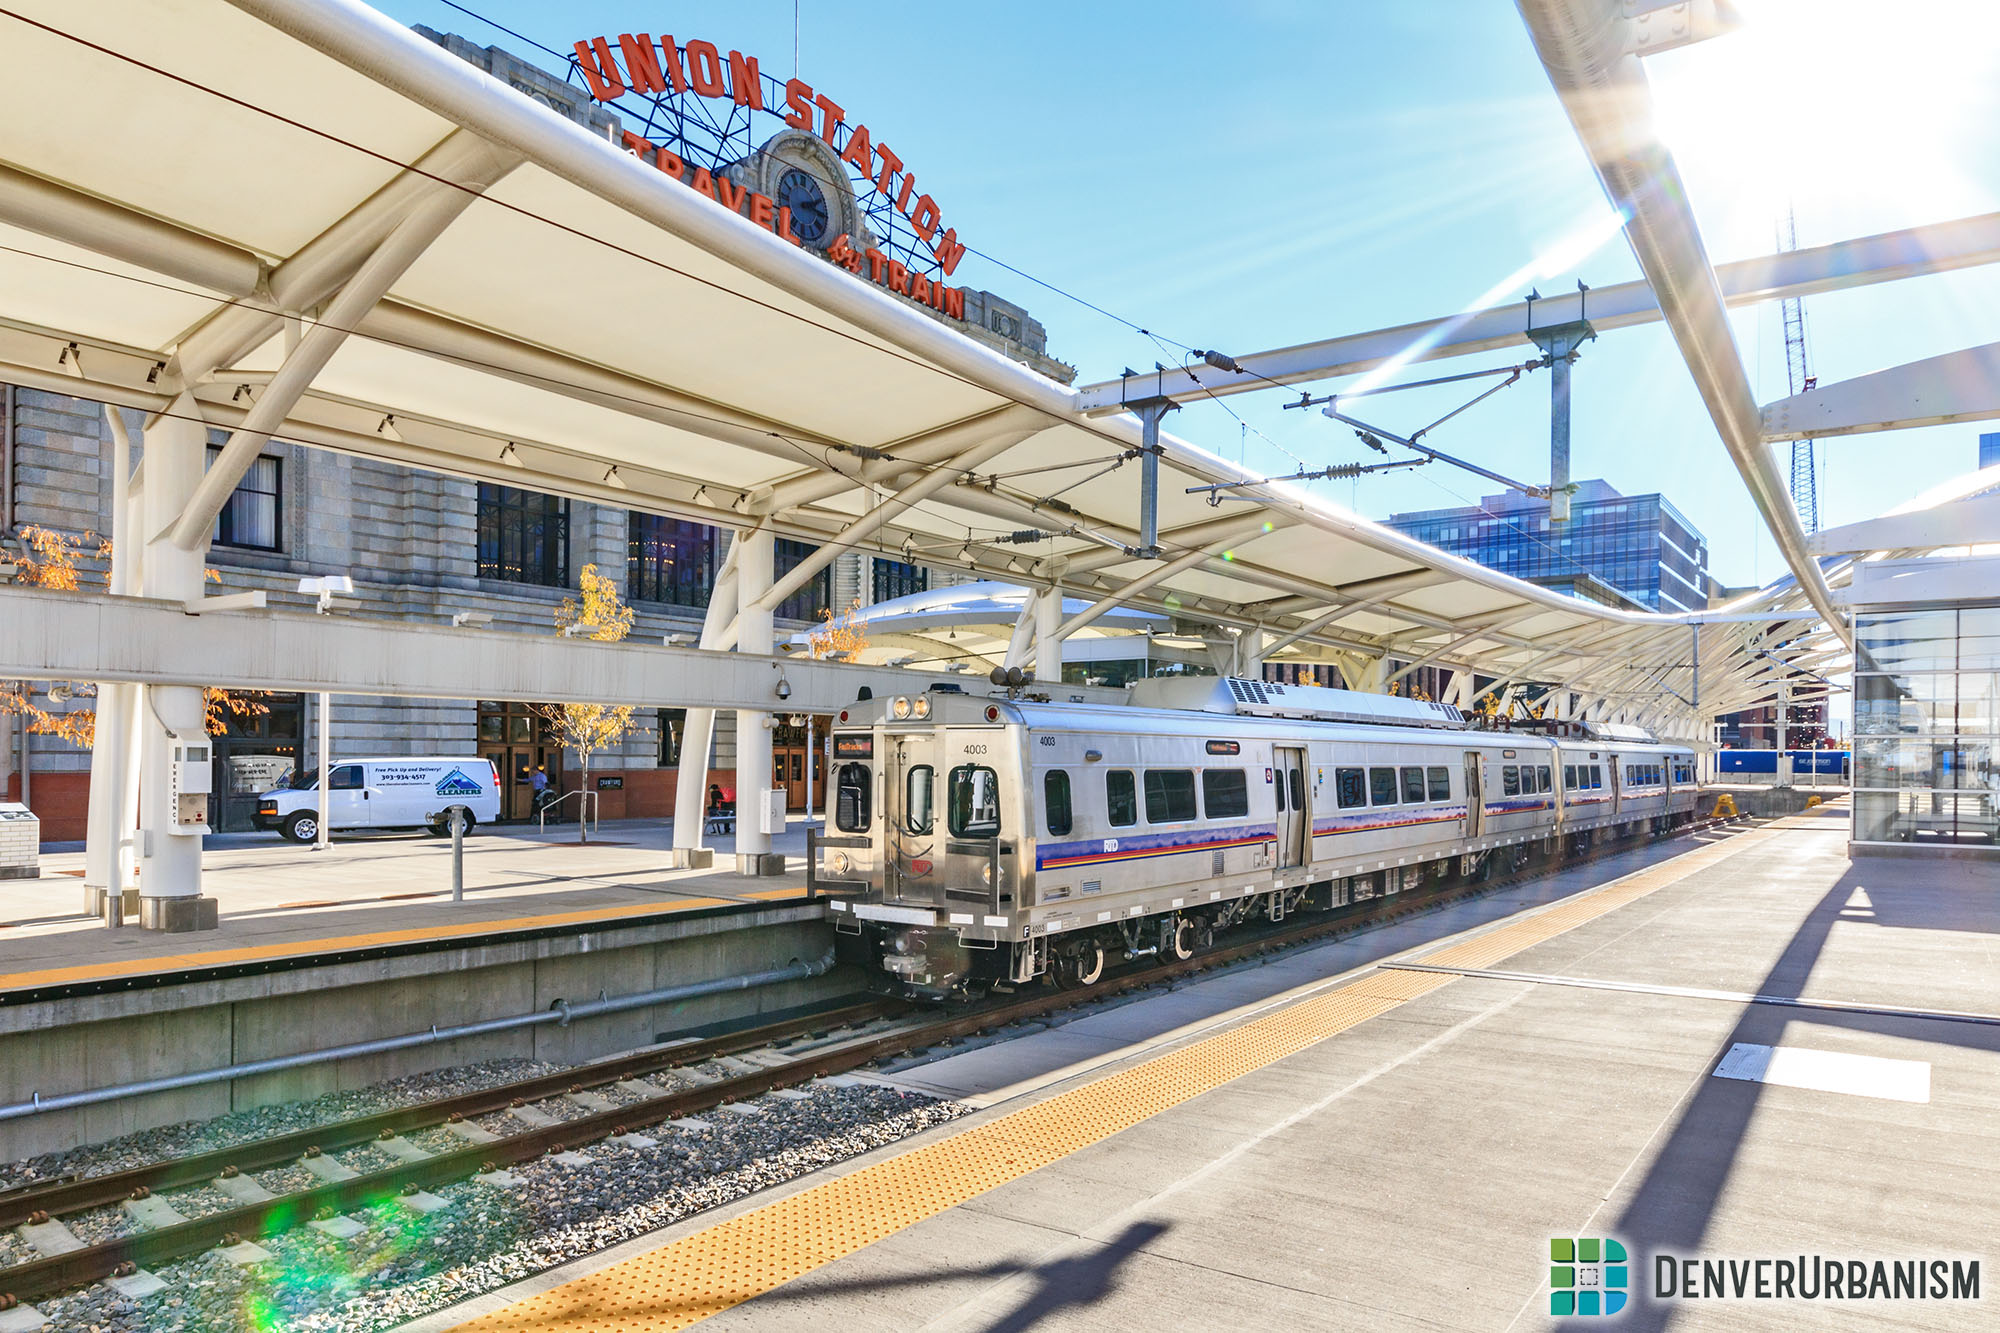 2016-04-19_SilverlinerV-7